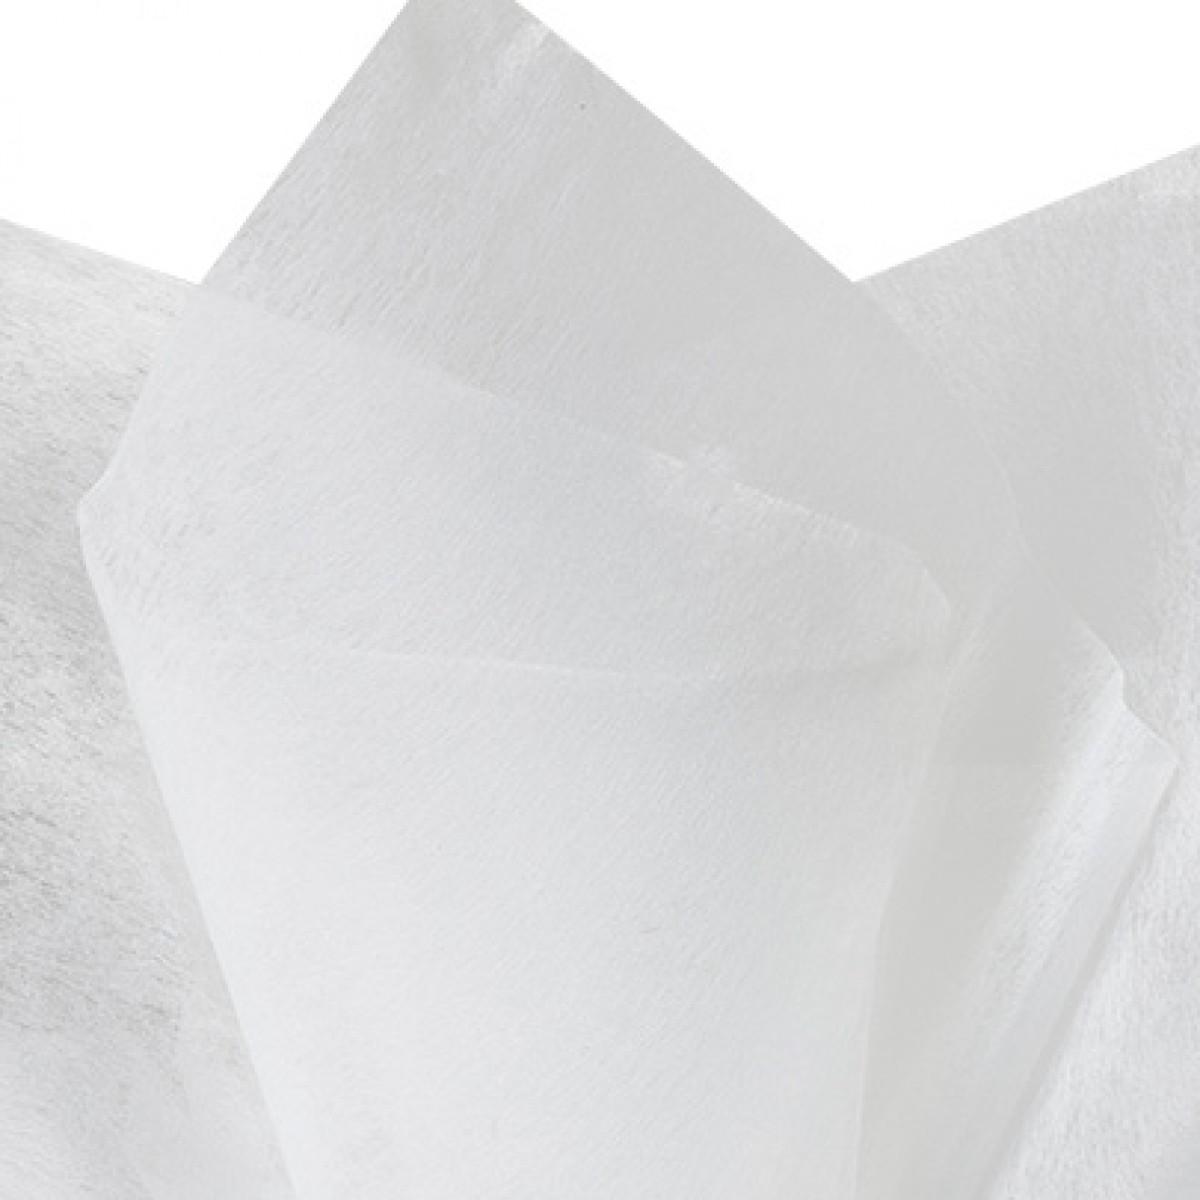 Ivory 75cmx60cm Tissue Floral Wraps - 50 Sheets